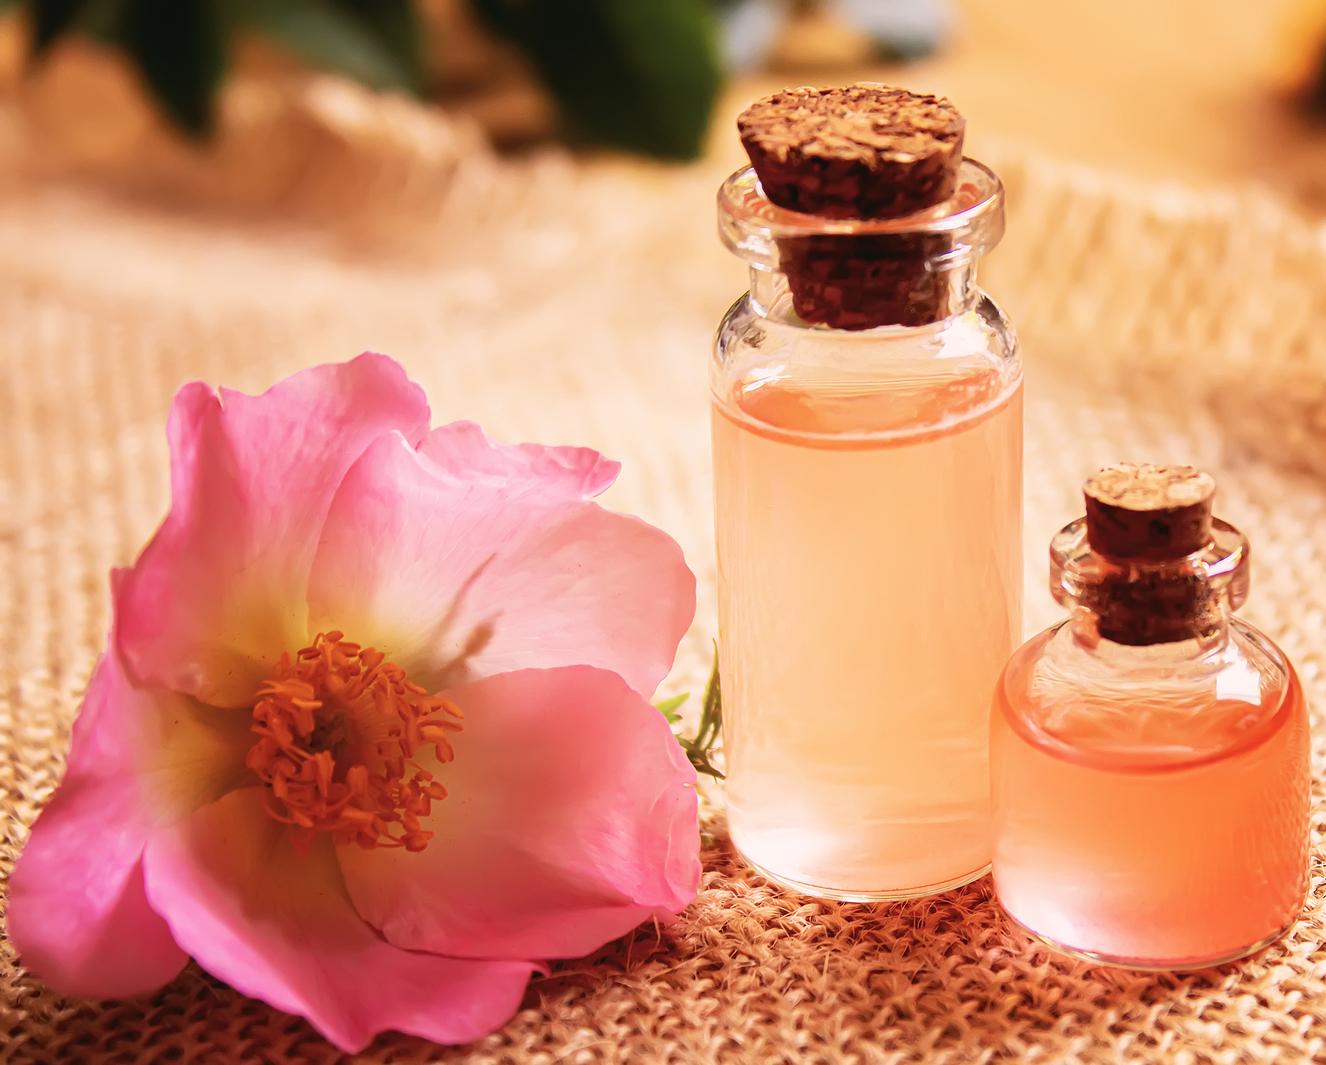 body-nectar-rose-cropped.jpg